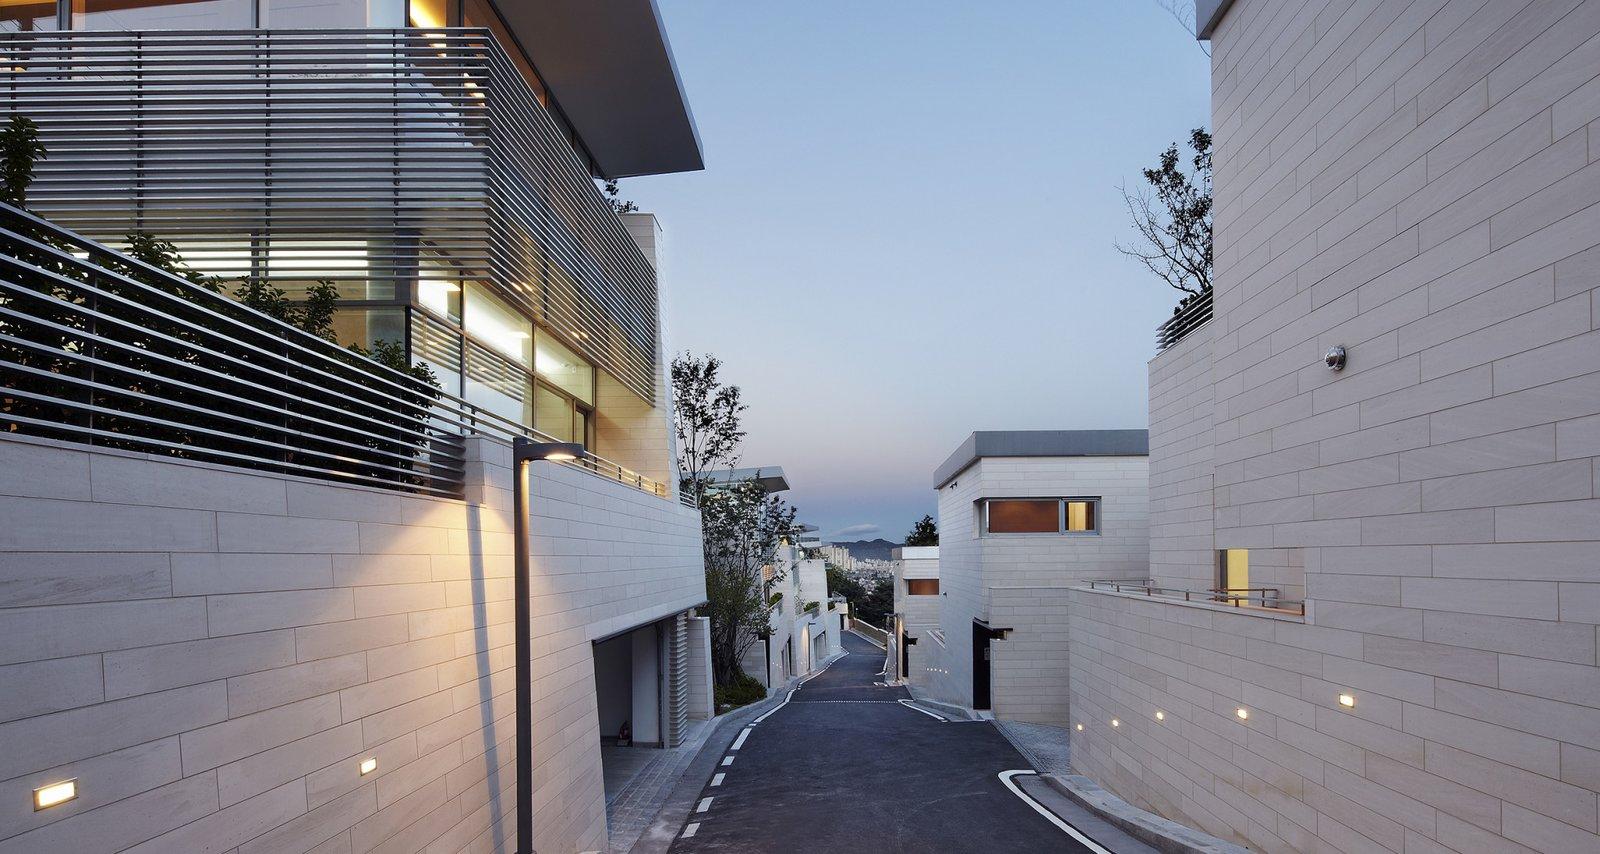 #SeongbukdongResidence #modern #midcentury #enclave #sustainable #L-shaped #exterior #outside #outdoors #structure #street #lighting #geometry #garage #driveway #Seoul #JoelSandersArchitects  Seongbukdong Residence